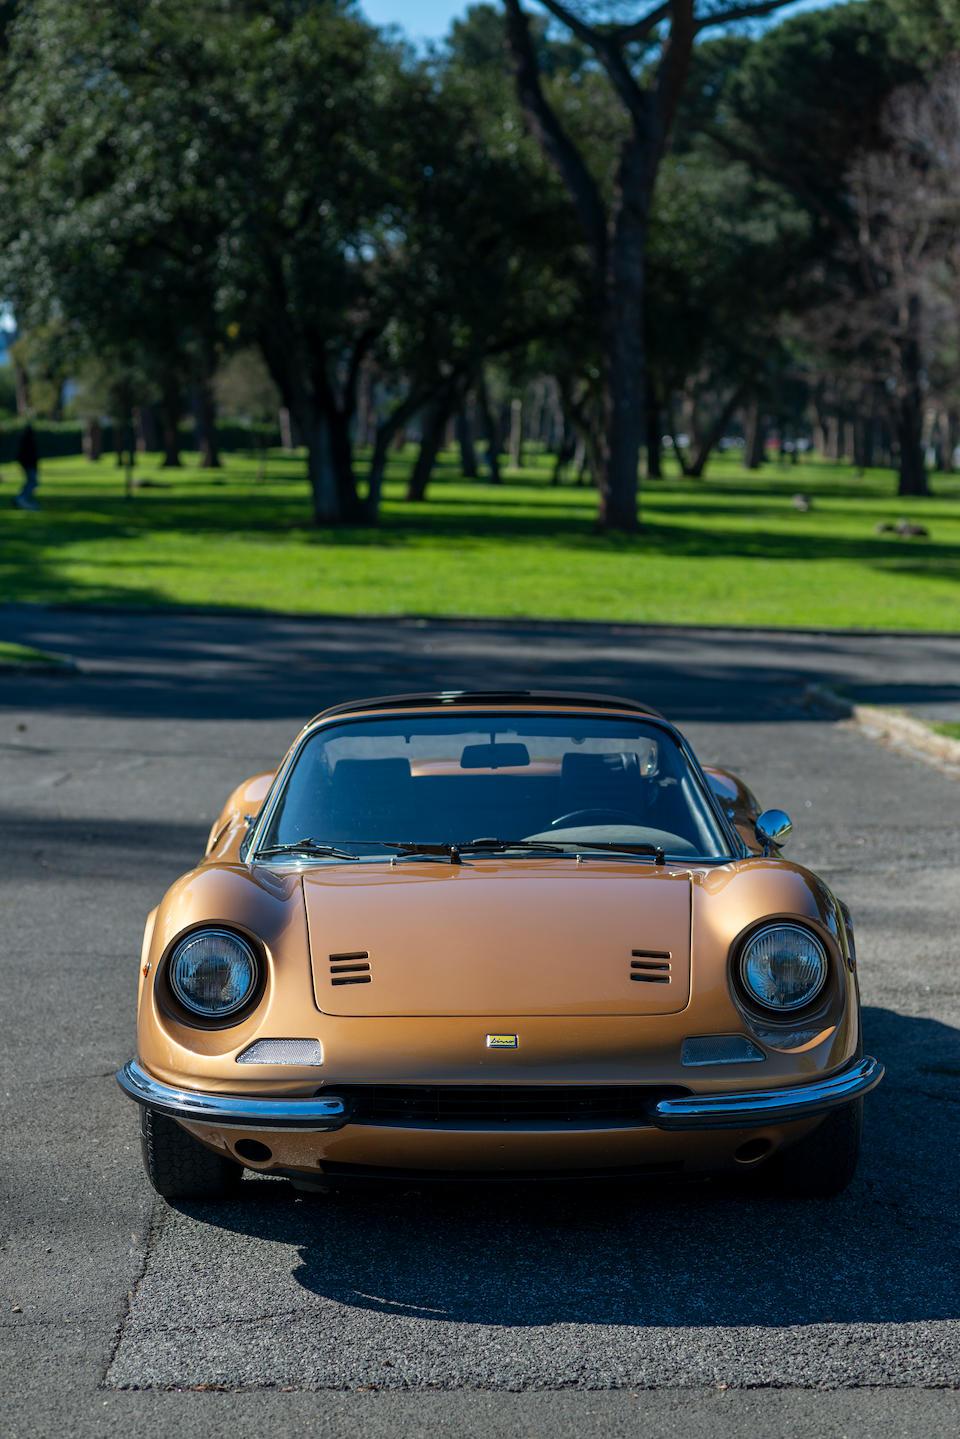 1973  Ferrari  Dino 246 GTS  Chassis no. 05508 Engine no. 135 CS 10887